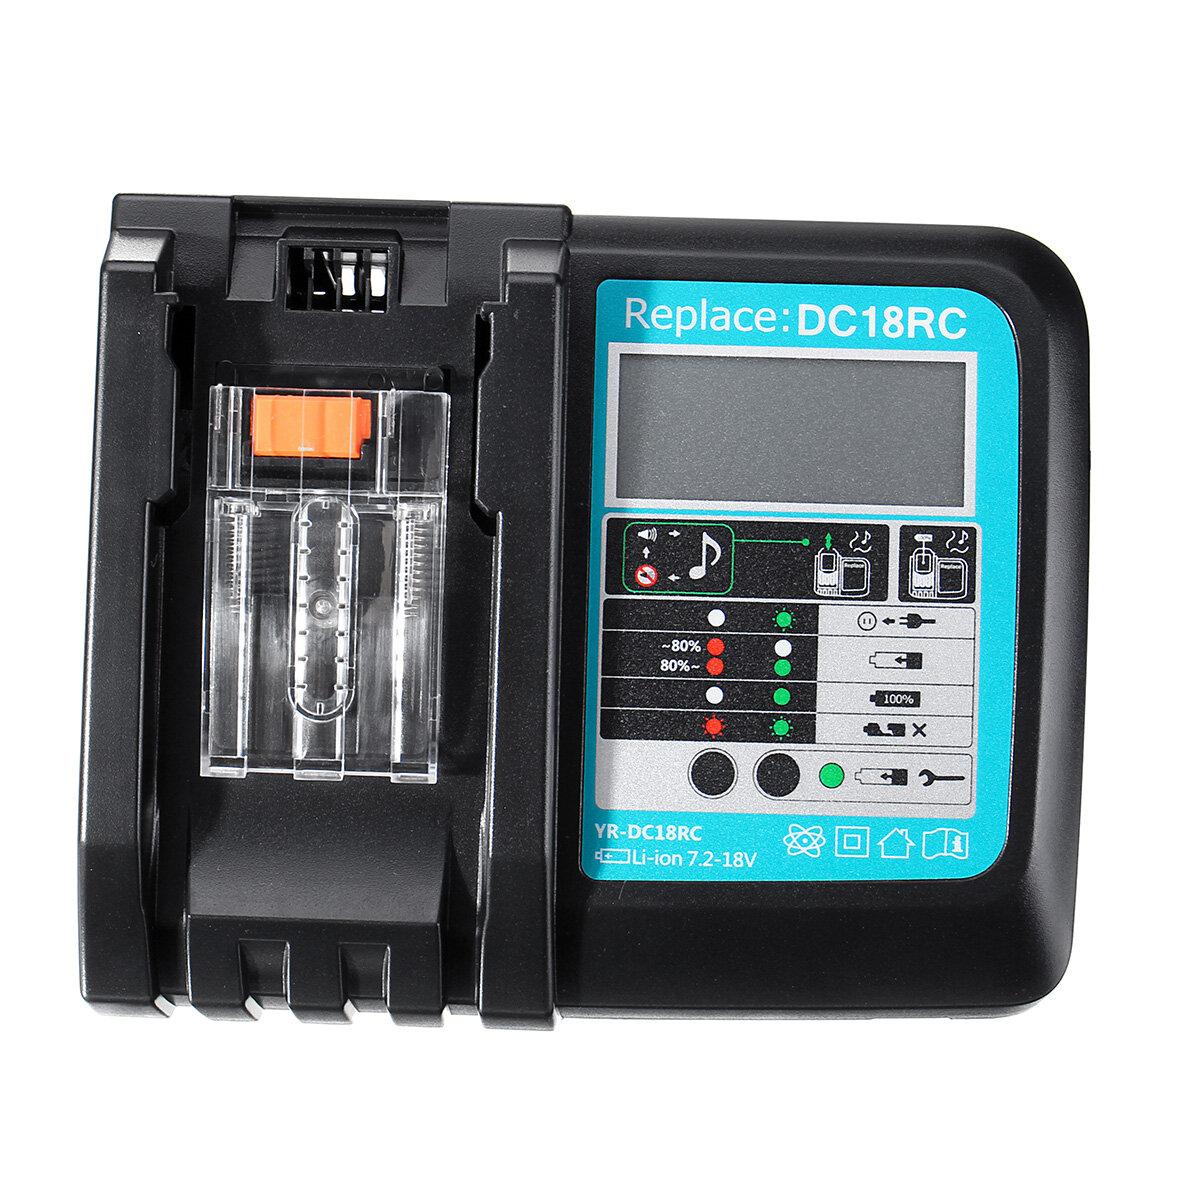 Картинка - DC18RC быстрое литий-ионное зарядное устройство USB Батарея LED Дисплей BL1830 BL1840 BL1850 для 14,4 В 18 В Makita Бата